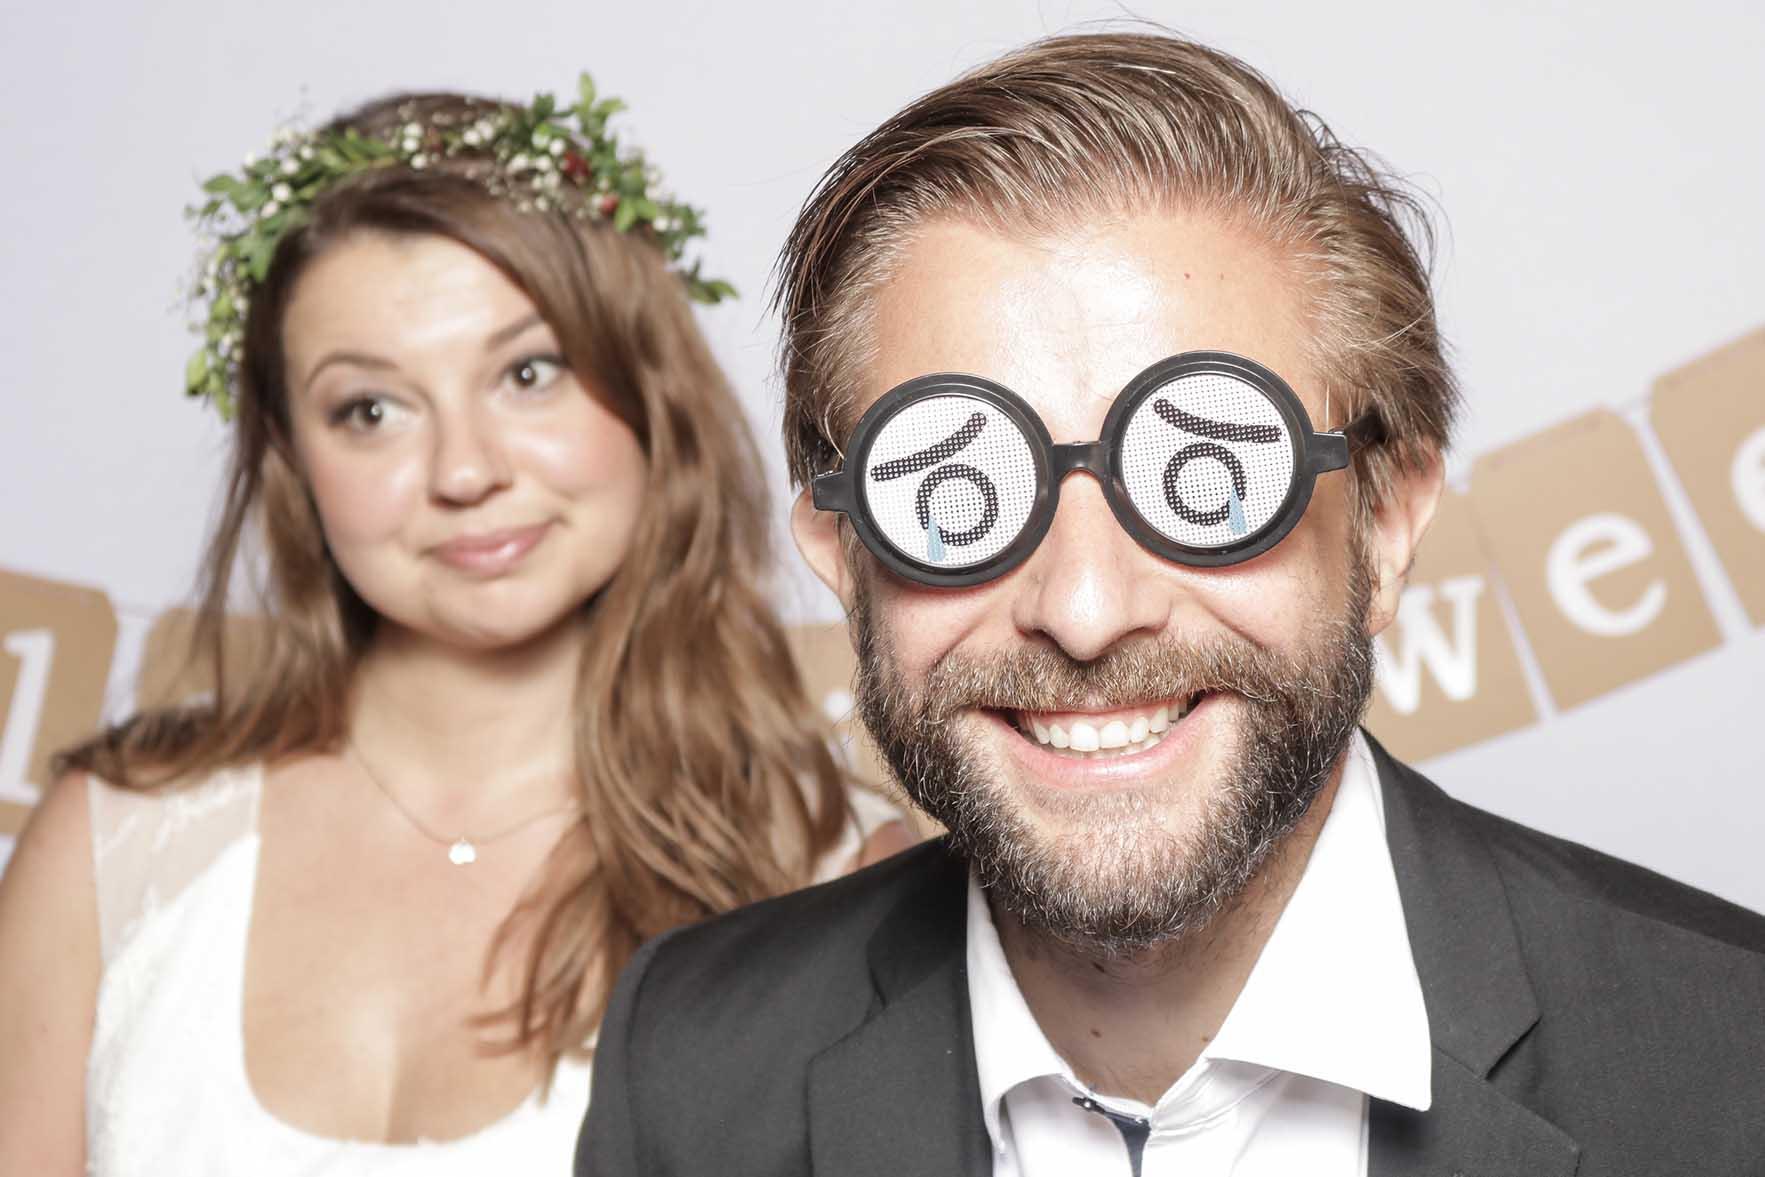 Selfiemaster | Hochzeits-Fotobox